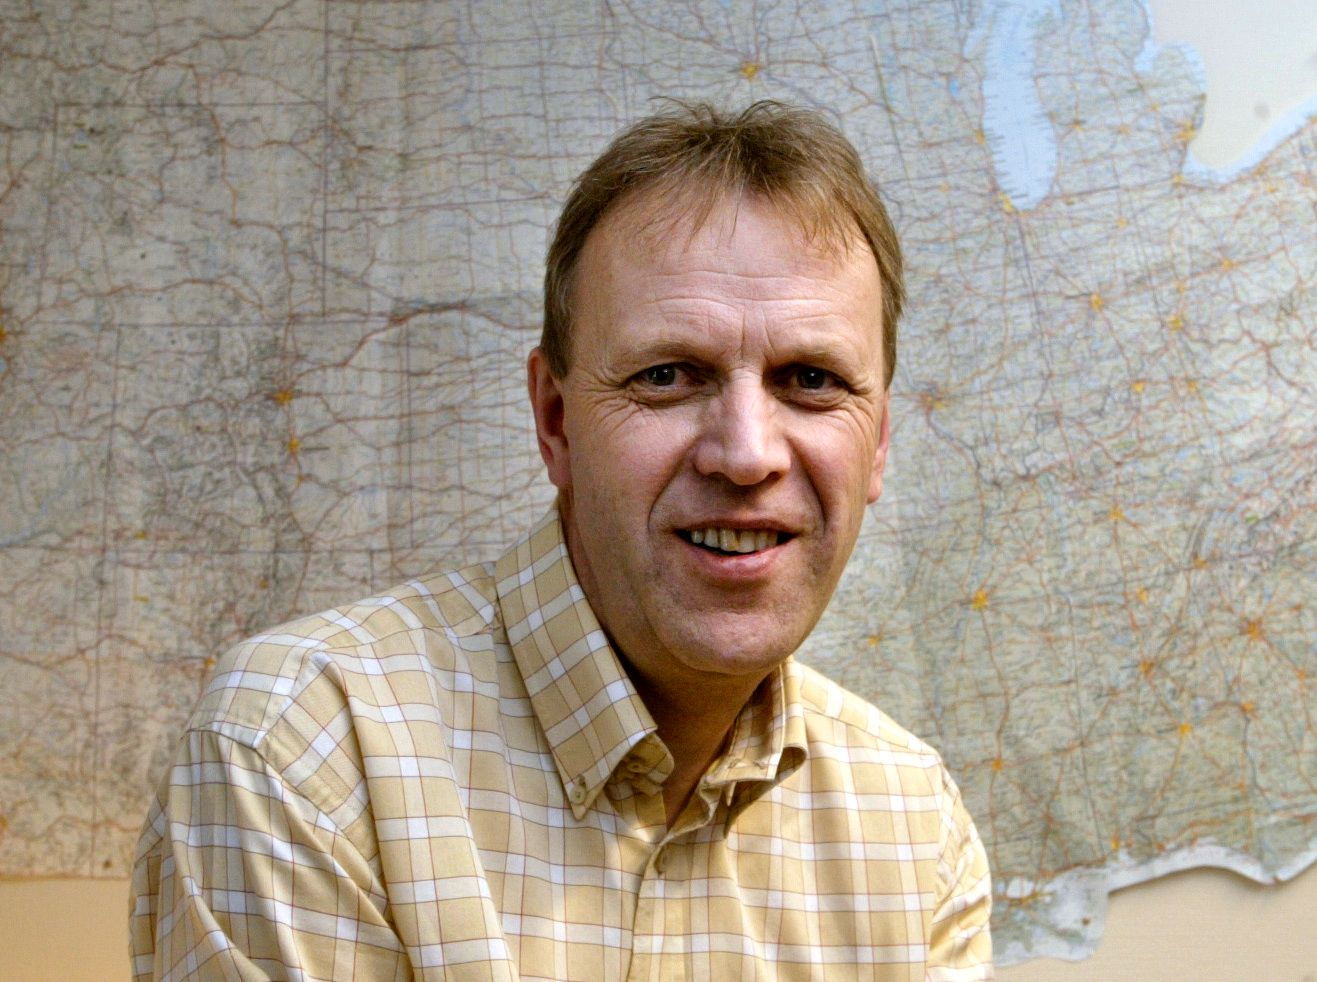 DRAMATISK: Forsker Svein Melby mener Trumps uttalelser om NATO er dramatiske.